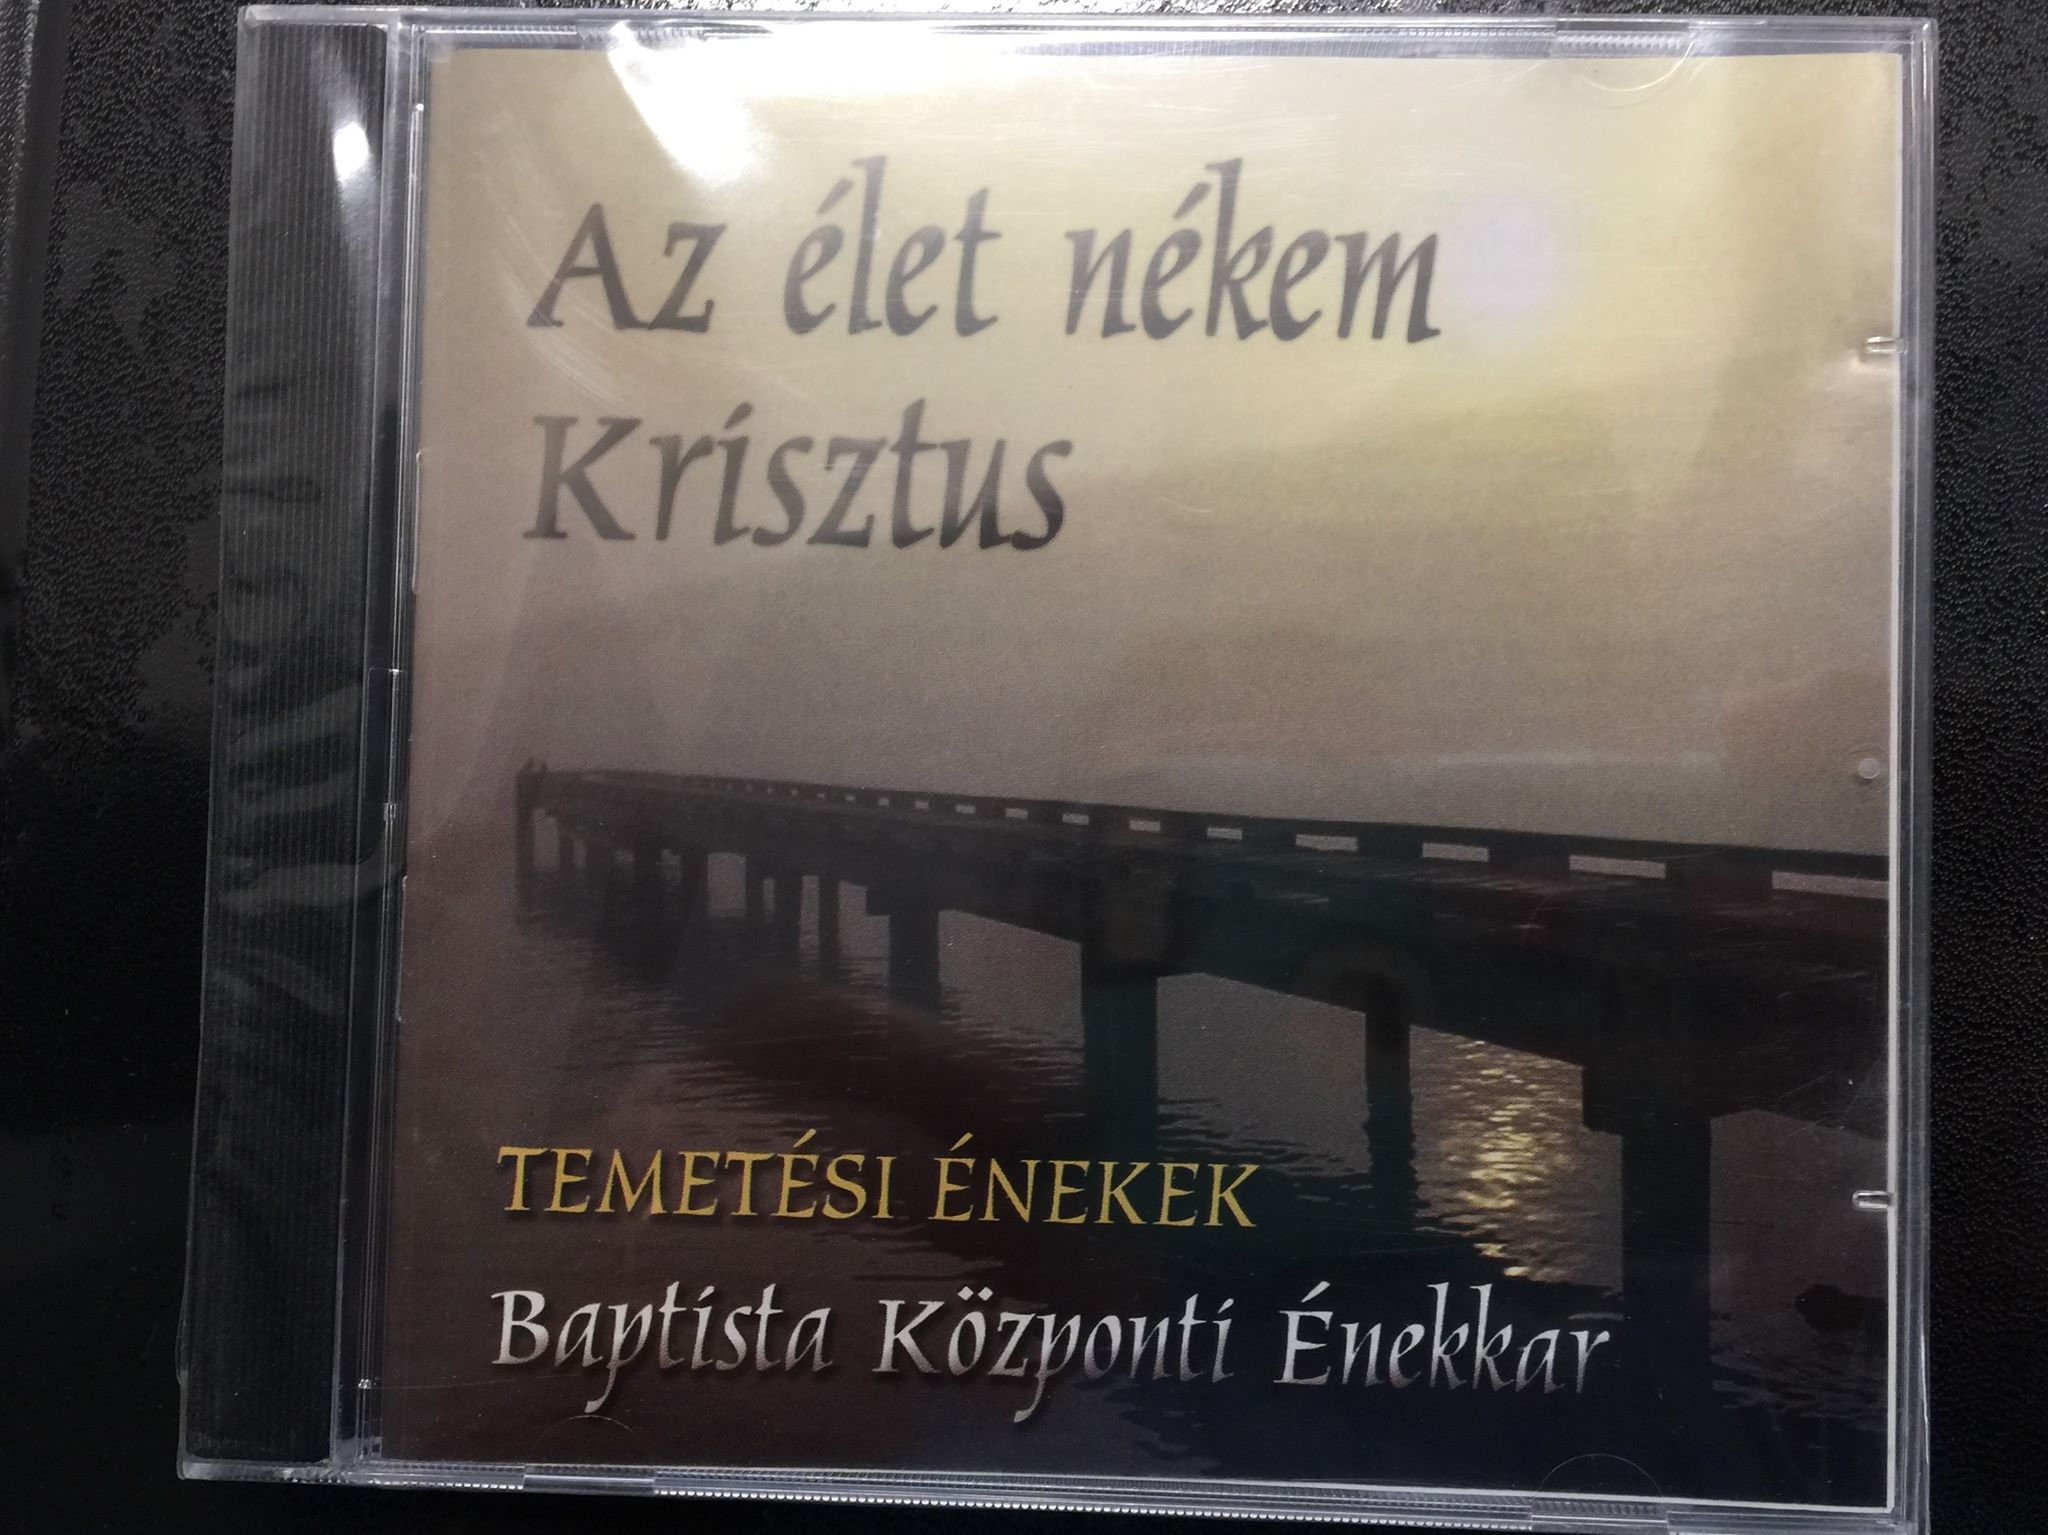 az-let-n-kem-krisztus-temet-si-nekek-baptista-k-zponti-nekkar-for-to-me-to-live-is-christ-baptist-funeral-songs-hymns-conducted-by-ol-h-g-bor-audio-cd-bmm-2010-cl01-1-.jpg